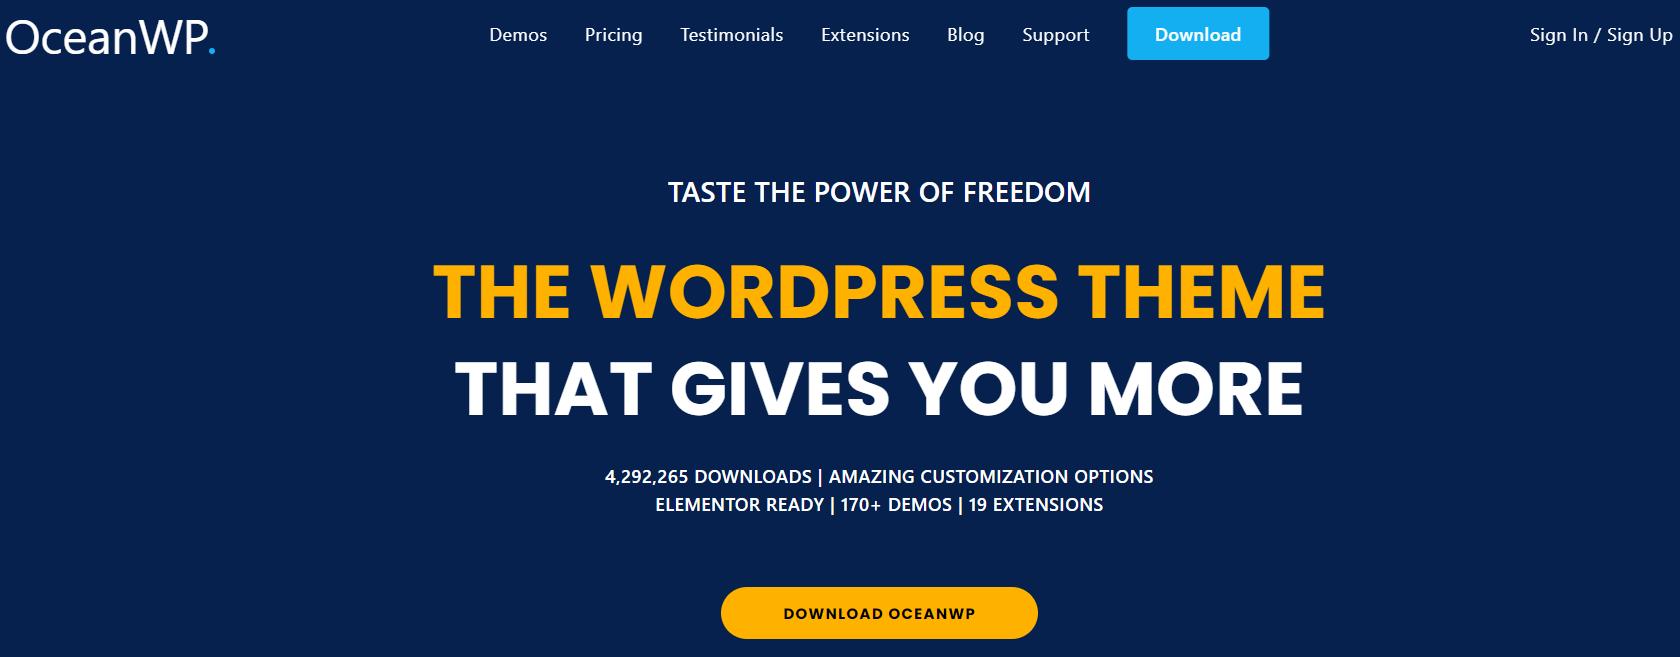 17 Best Free WordPress Themes for Business Consultancy 2021 6oQSYhvY5XqgWewMvRlGrgRBhthHLnENyymWyWNst ShFgnSFuoYJ6W BtHRP2OzcAN2yM QbVGYBmR Srrq geGJ 3eG U7pzsj8IFBGuAb jnT8UGABjExh9KAg2 UN5cmhyFx s0